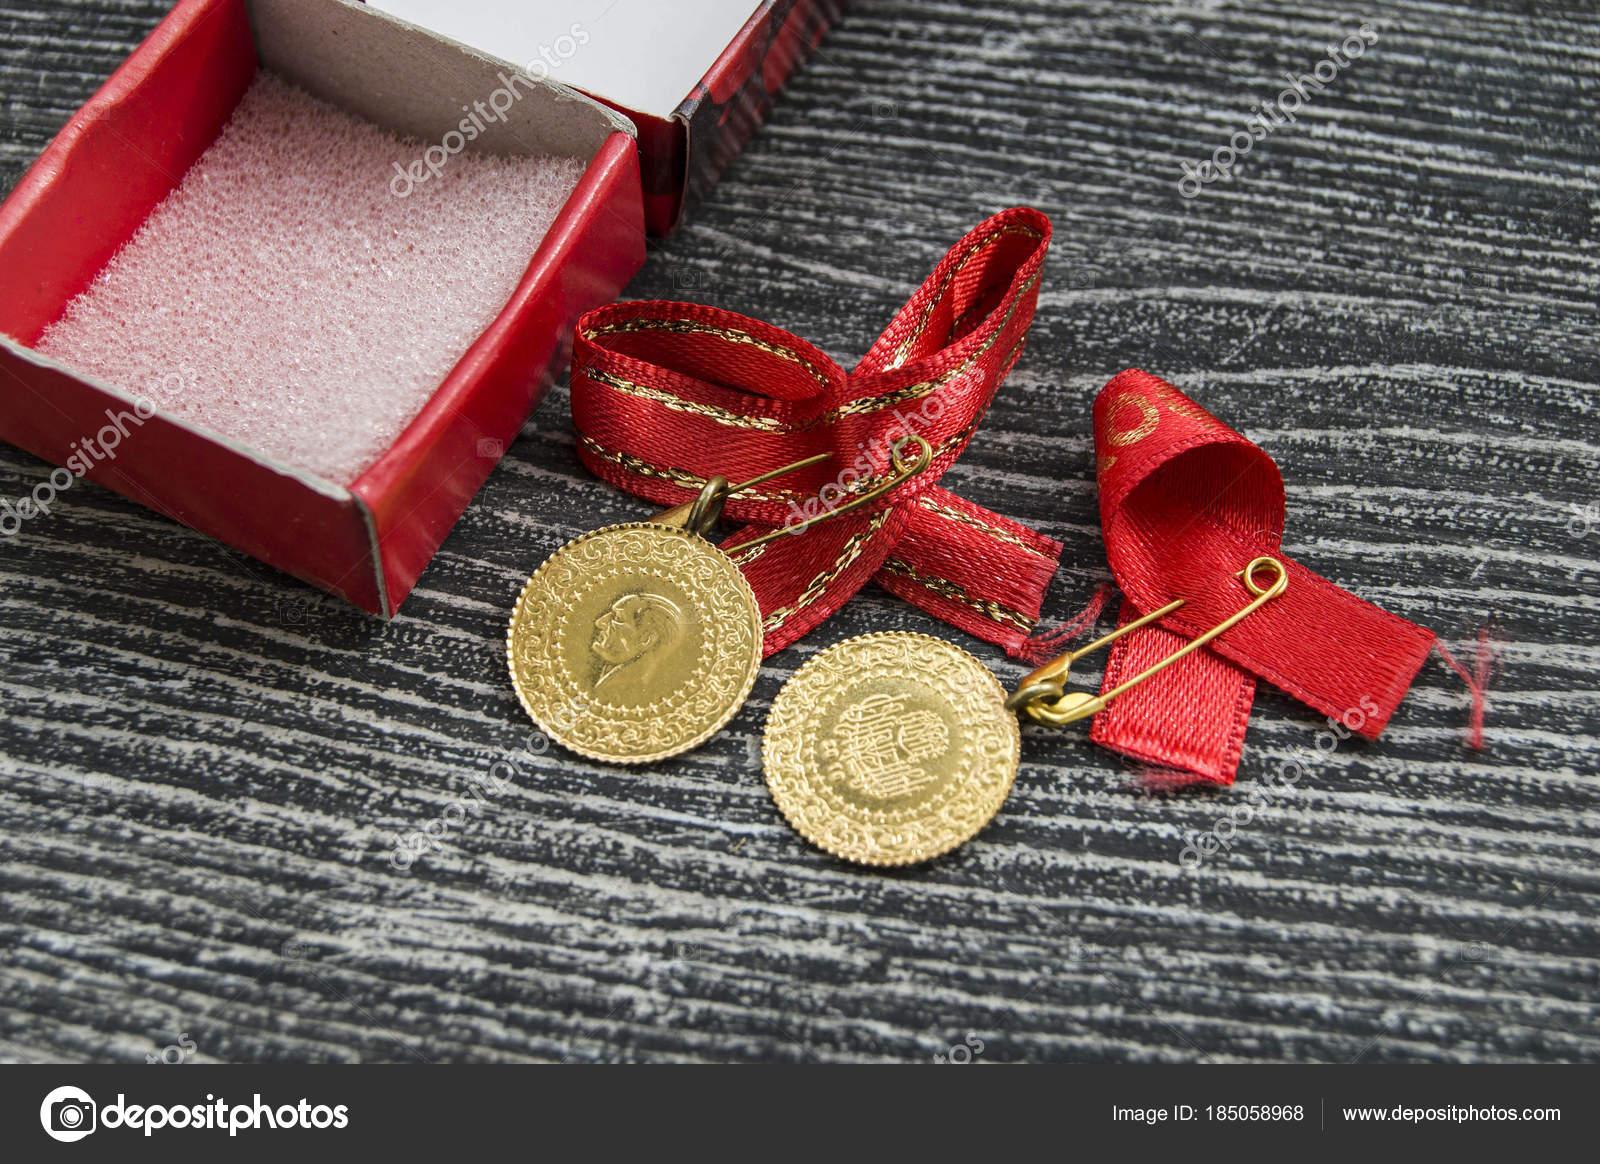 Turkish Quarter Gold Gifts Weddings Gold Prices Turkey State